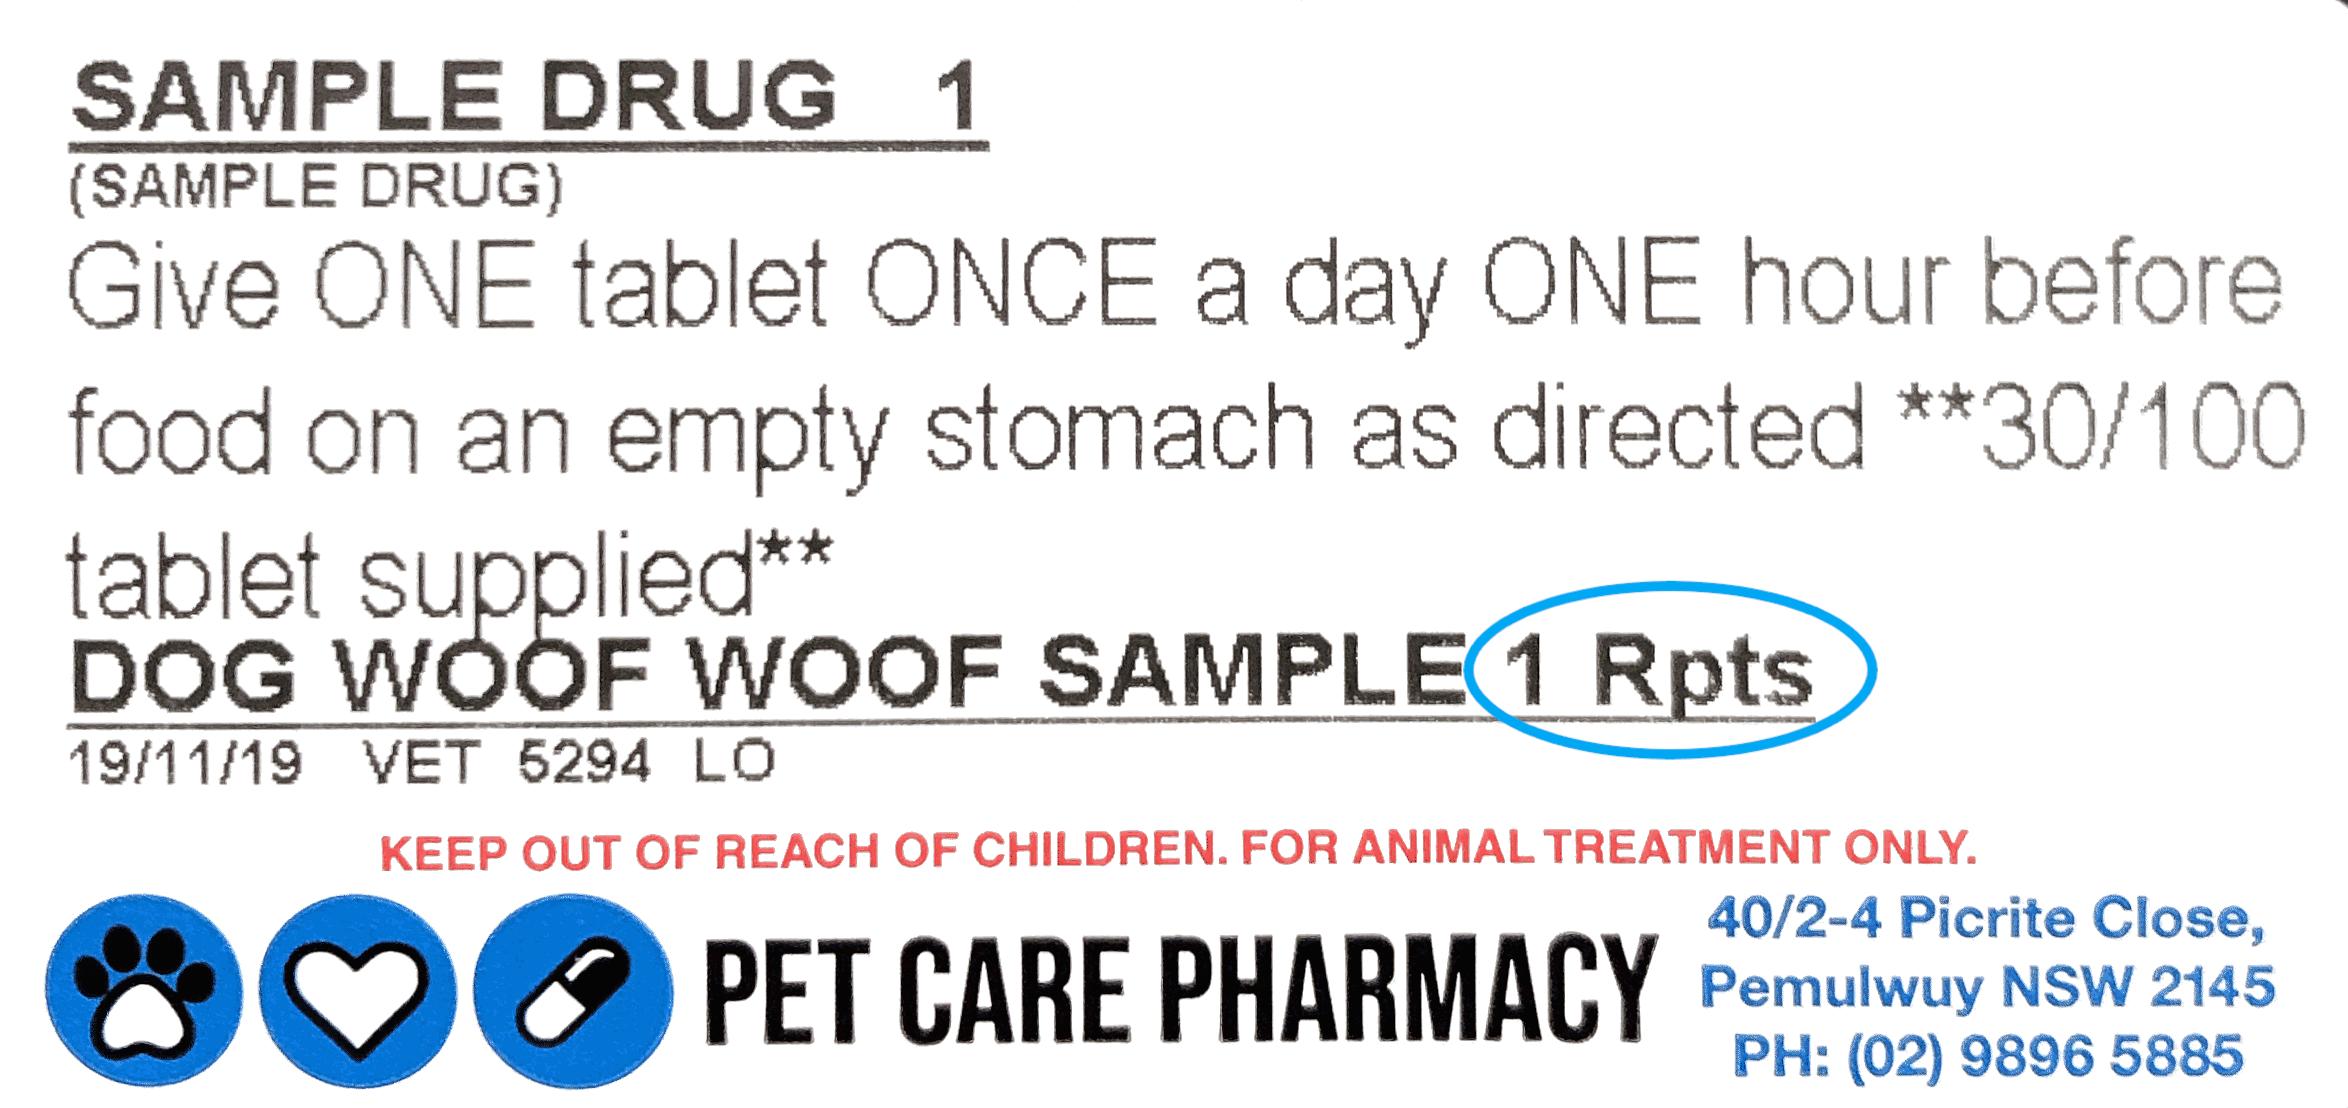 sample-label-1-1.png